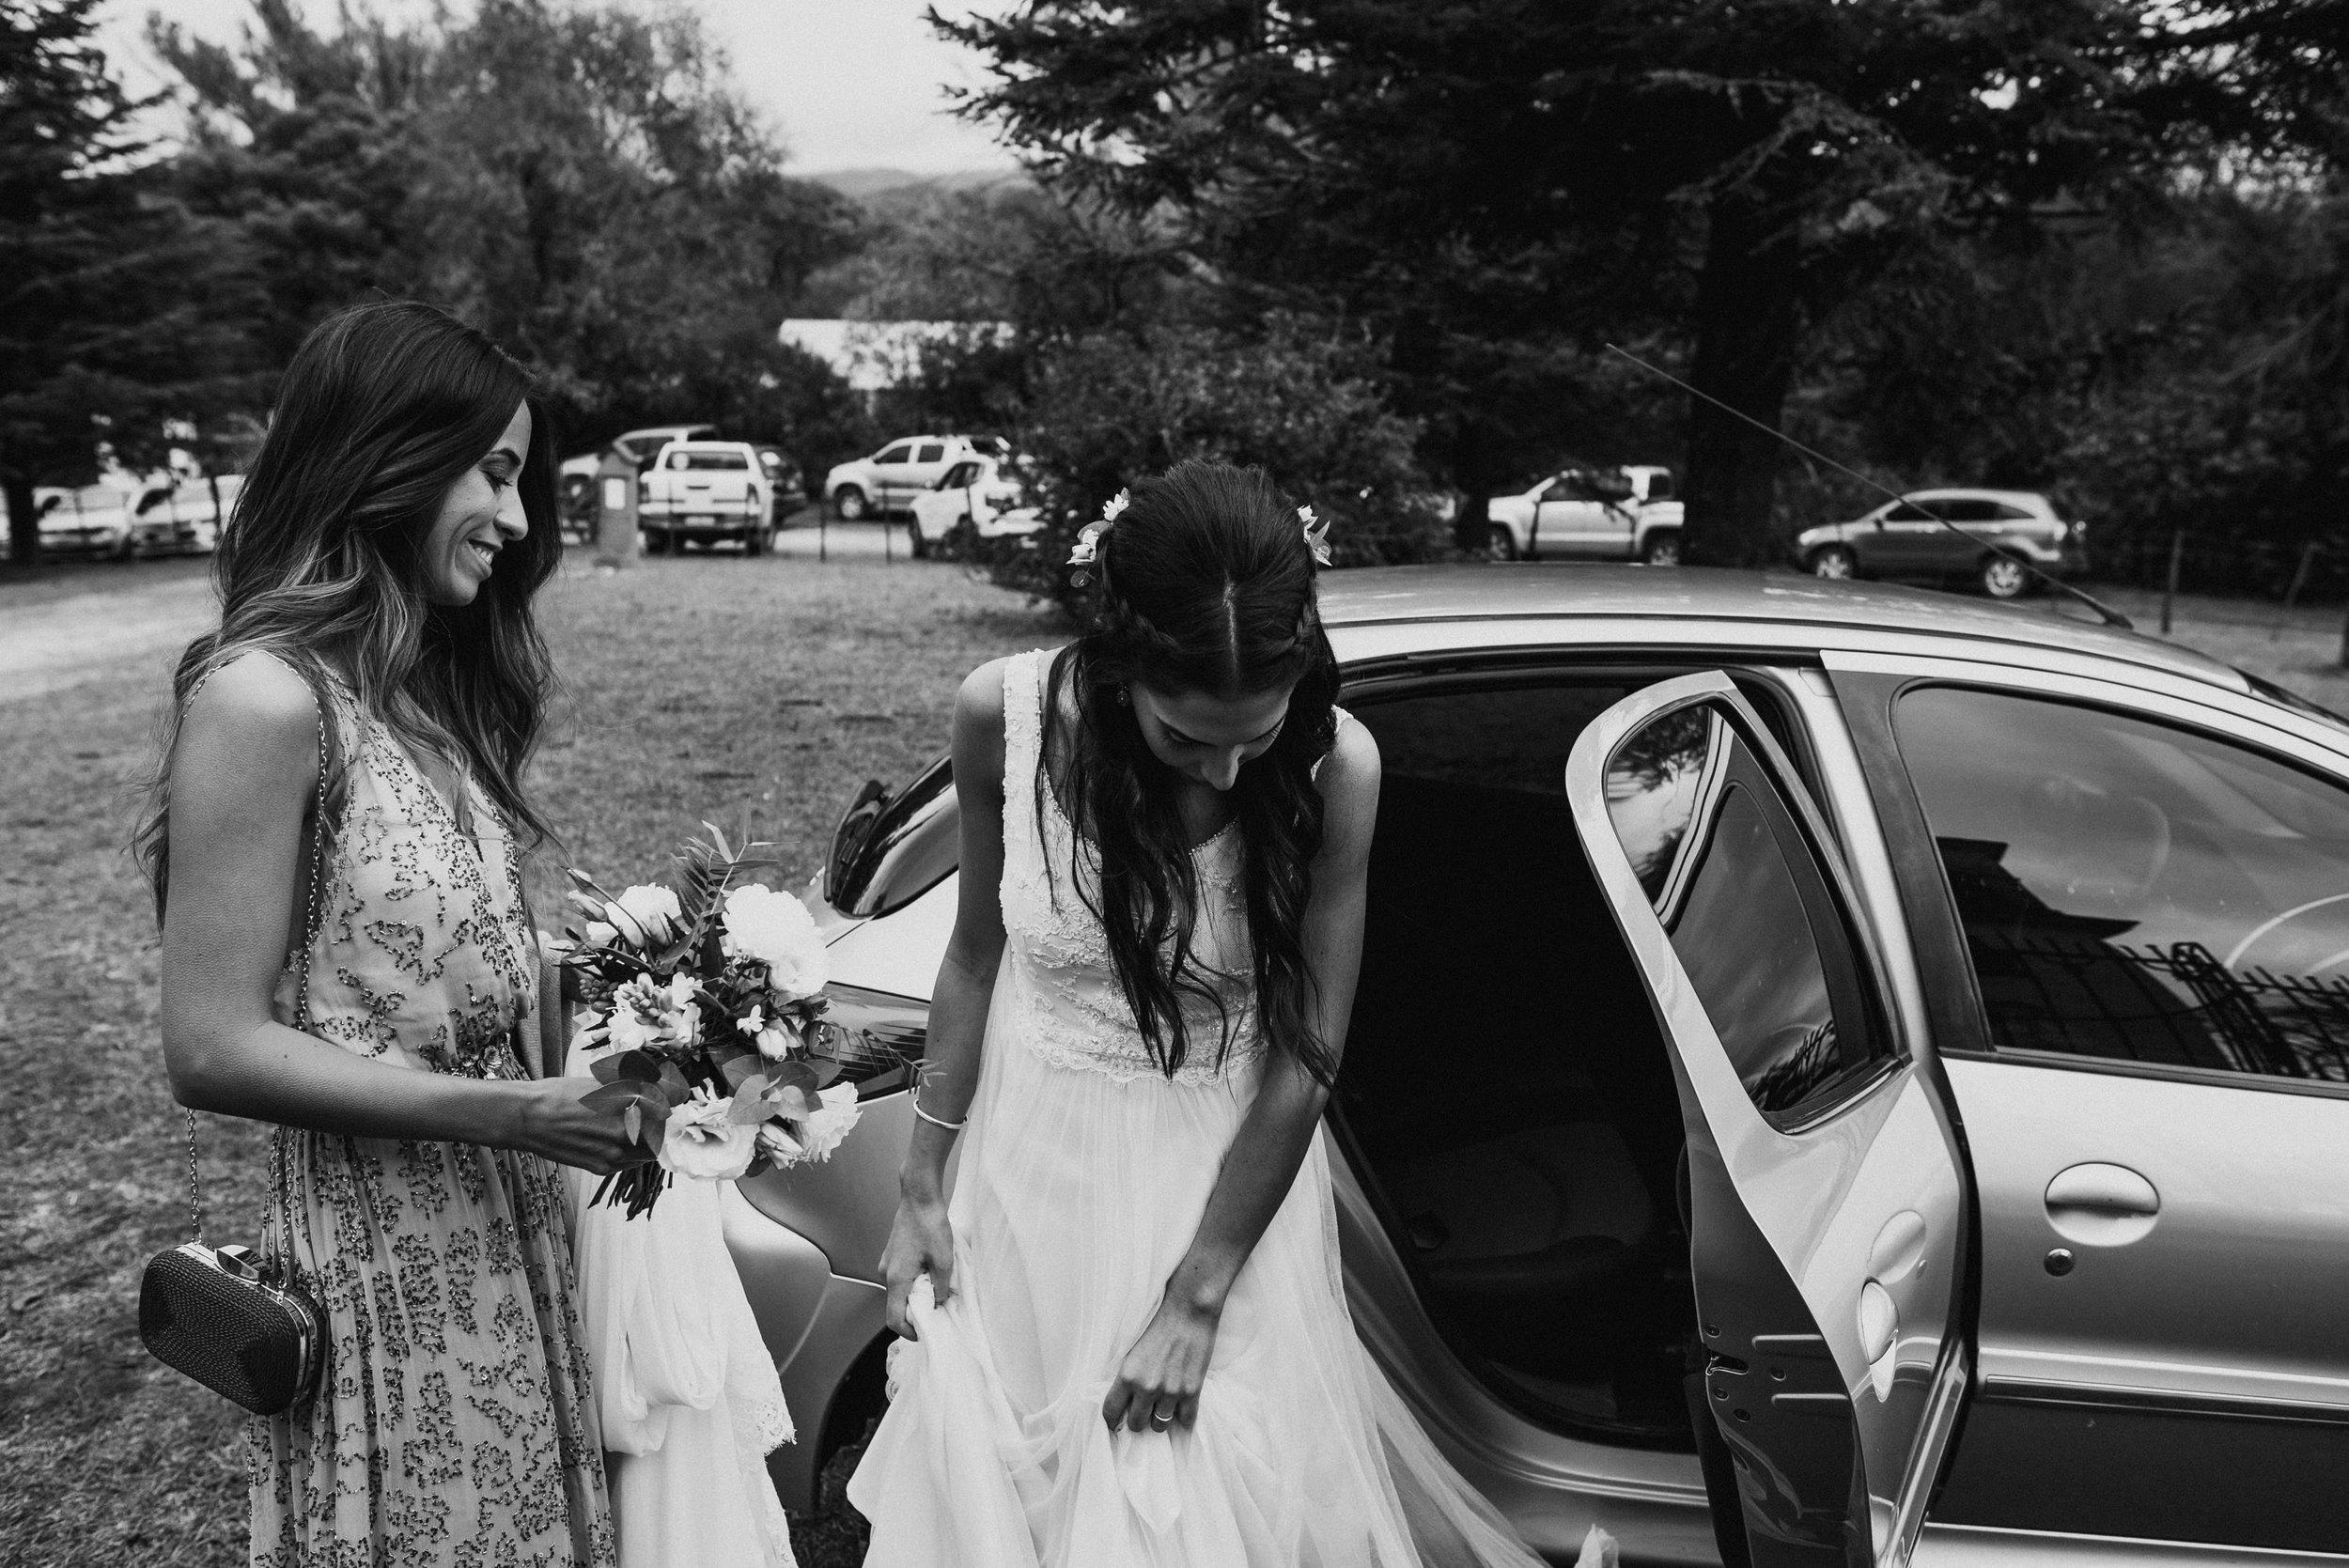 fotografo de bodas en carlos paz cordoba 014.JPG